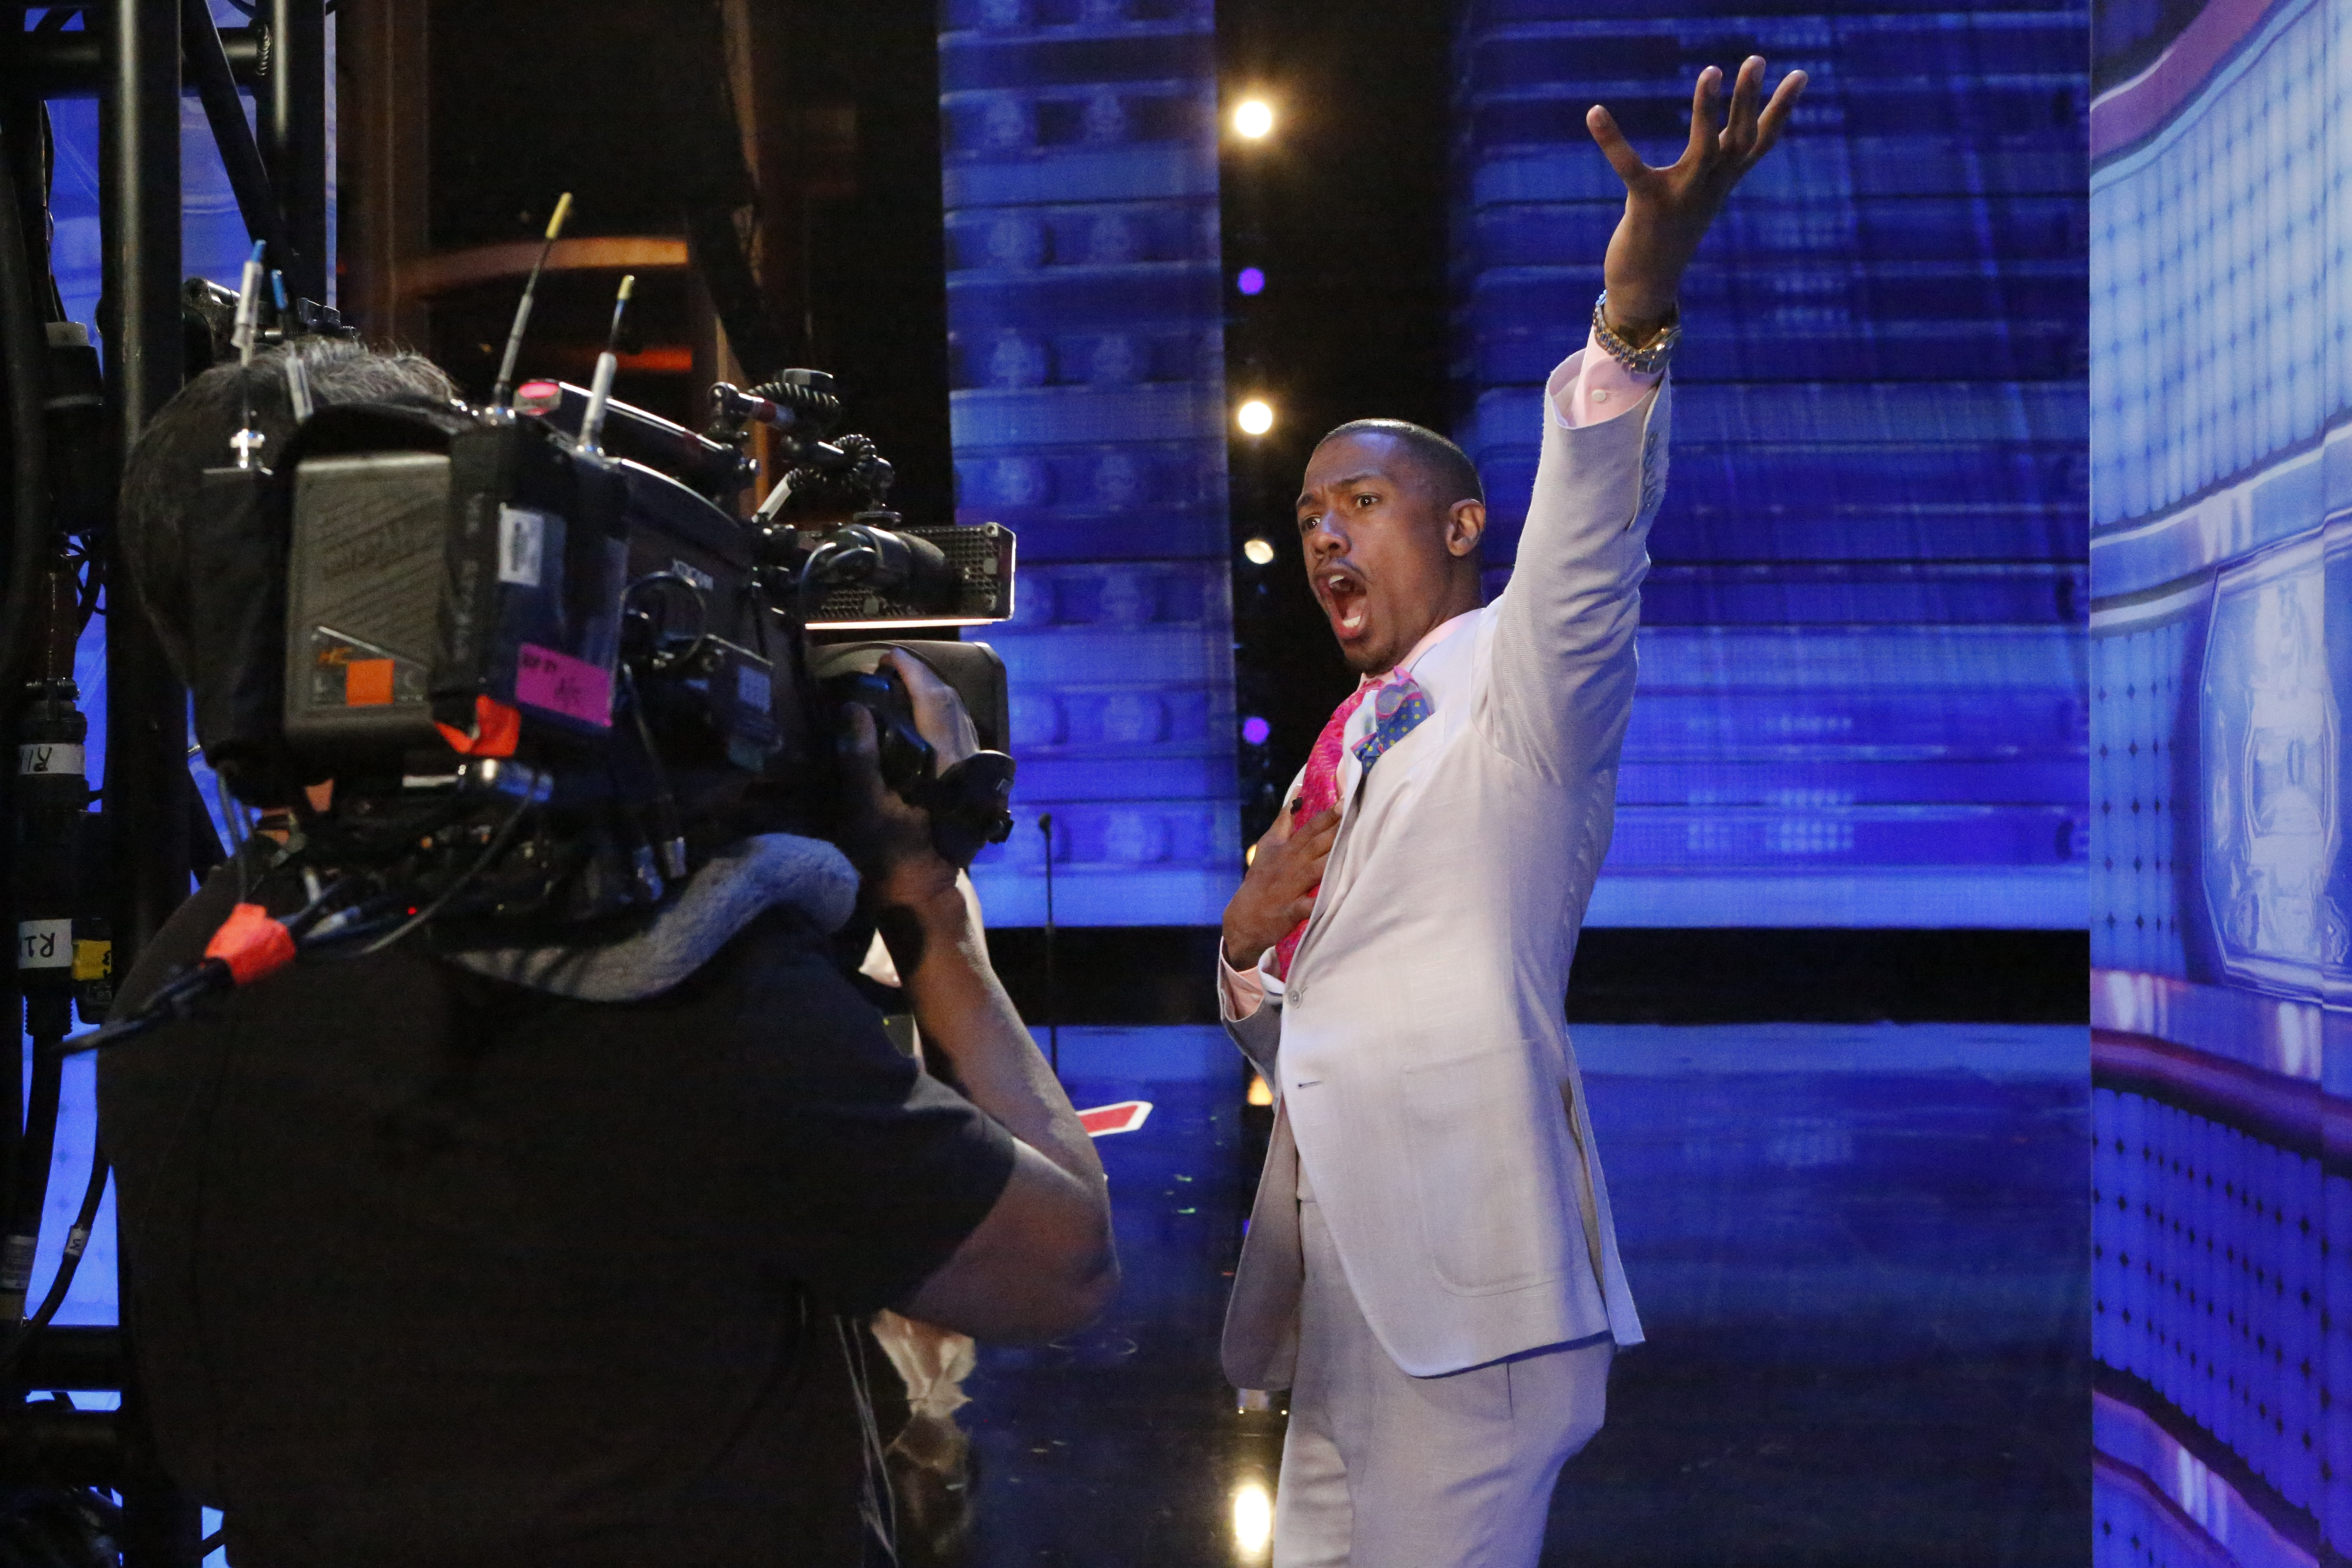 Americas Got Talent: Behind the Scenes: Quarterfinals